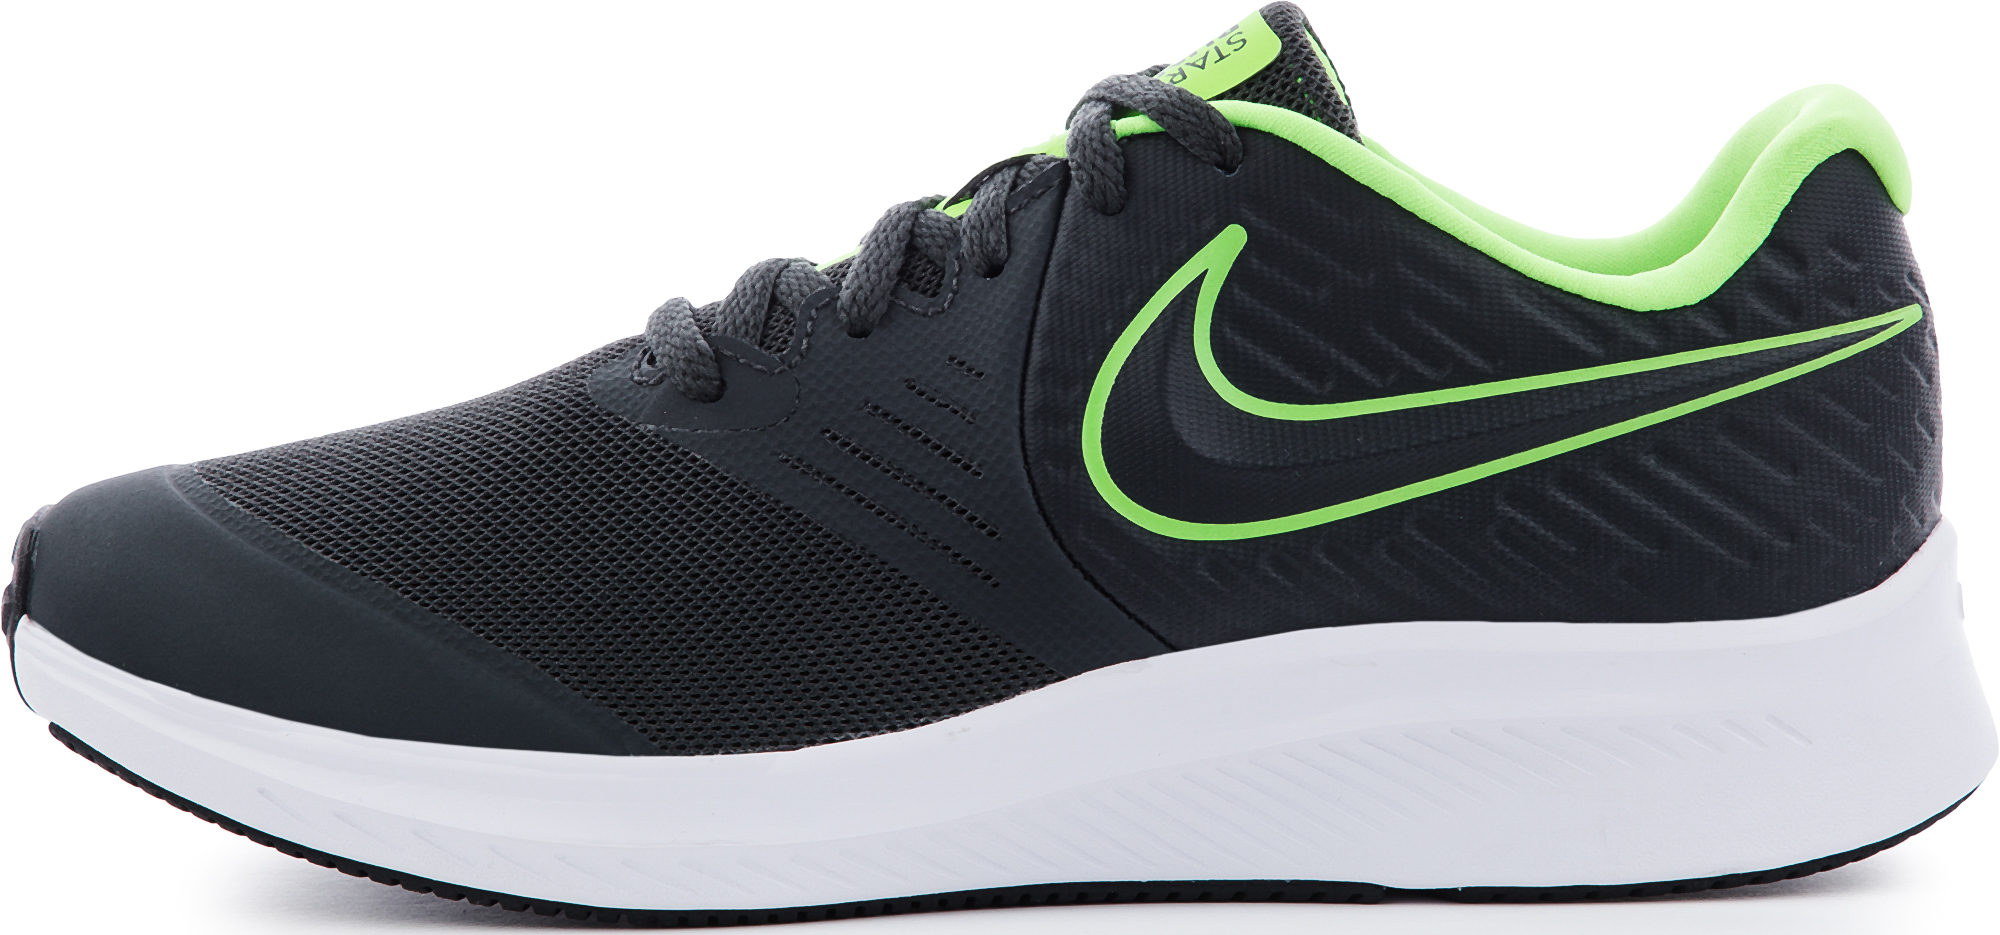 Nike Кроссовки для мальчиков Nike Star Runner 2 (Gs), размер 36,5 nike кроссовки для мальчиков nike lunar hayward размер 37 5